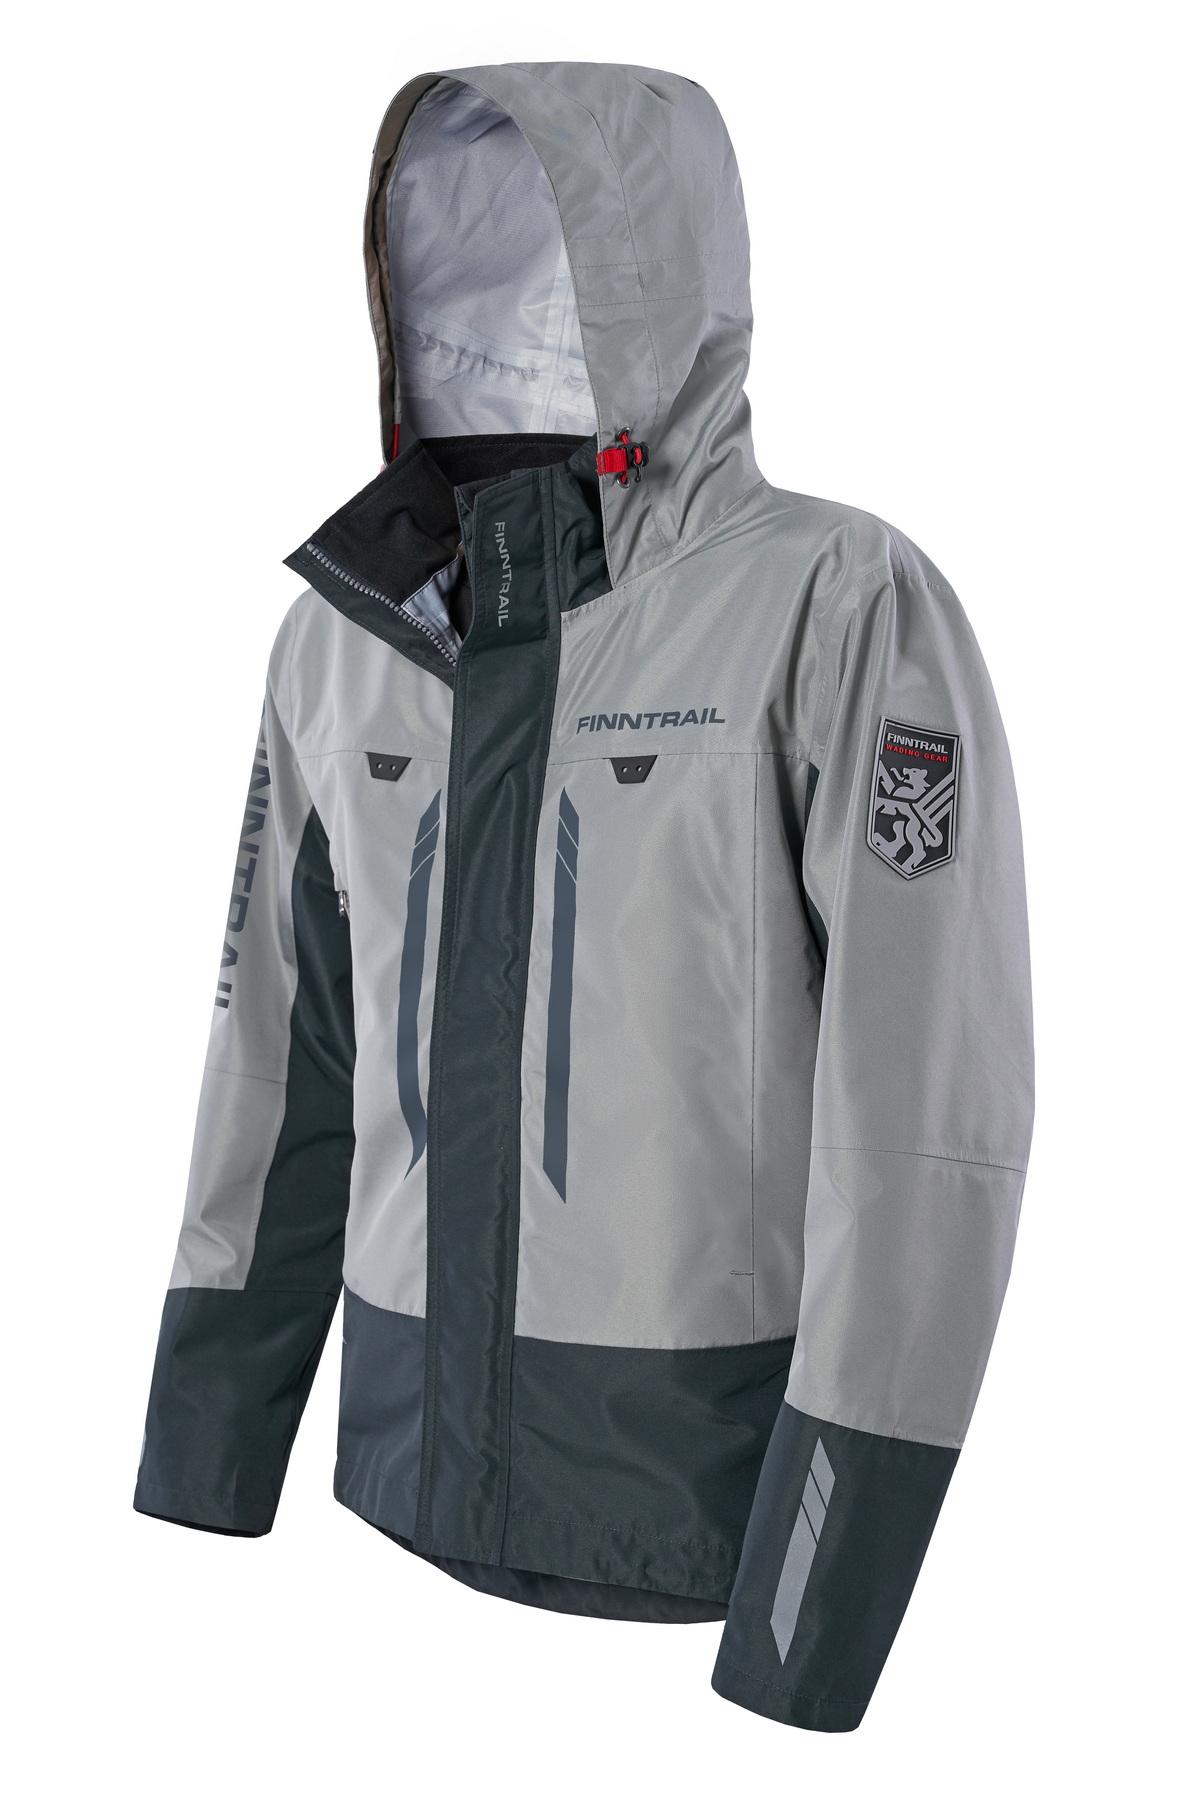 Finntrail Jacket GreenWood Grey